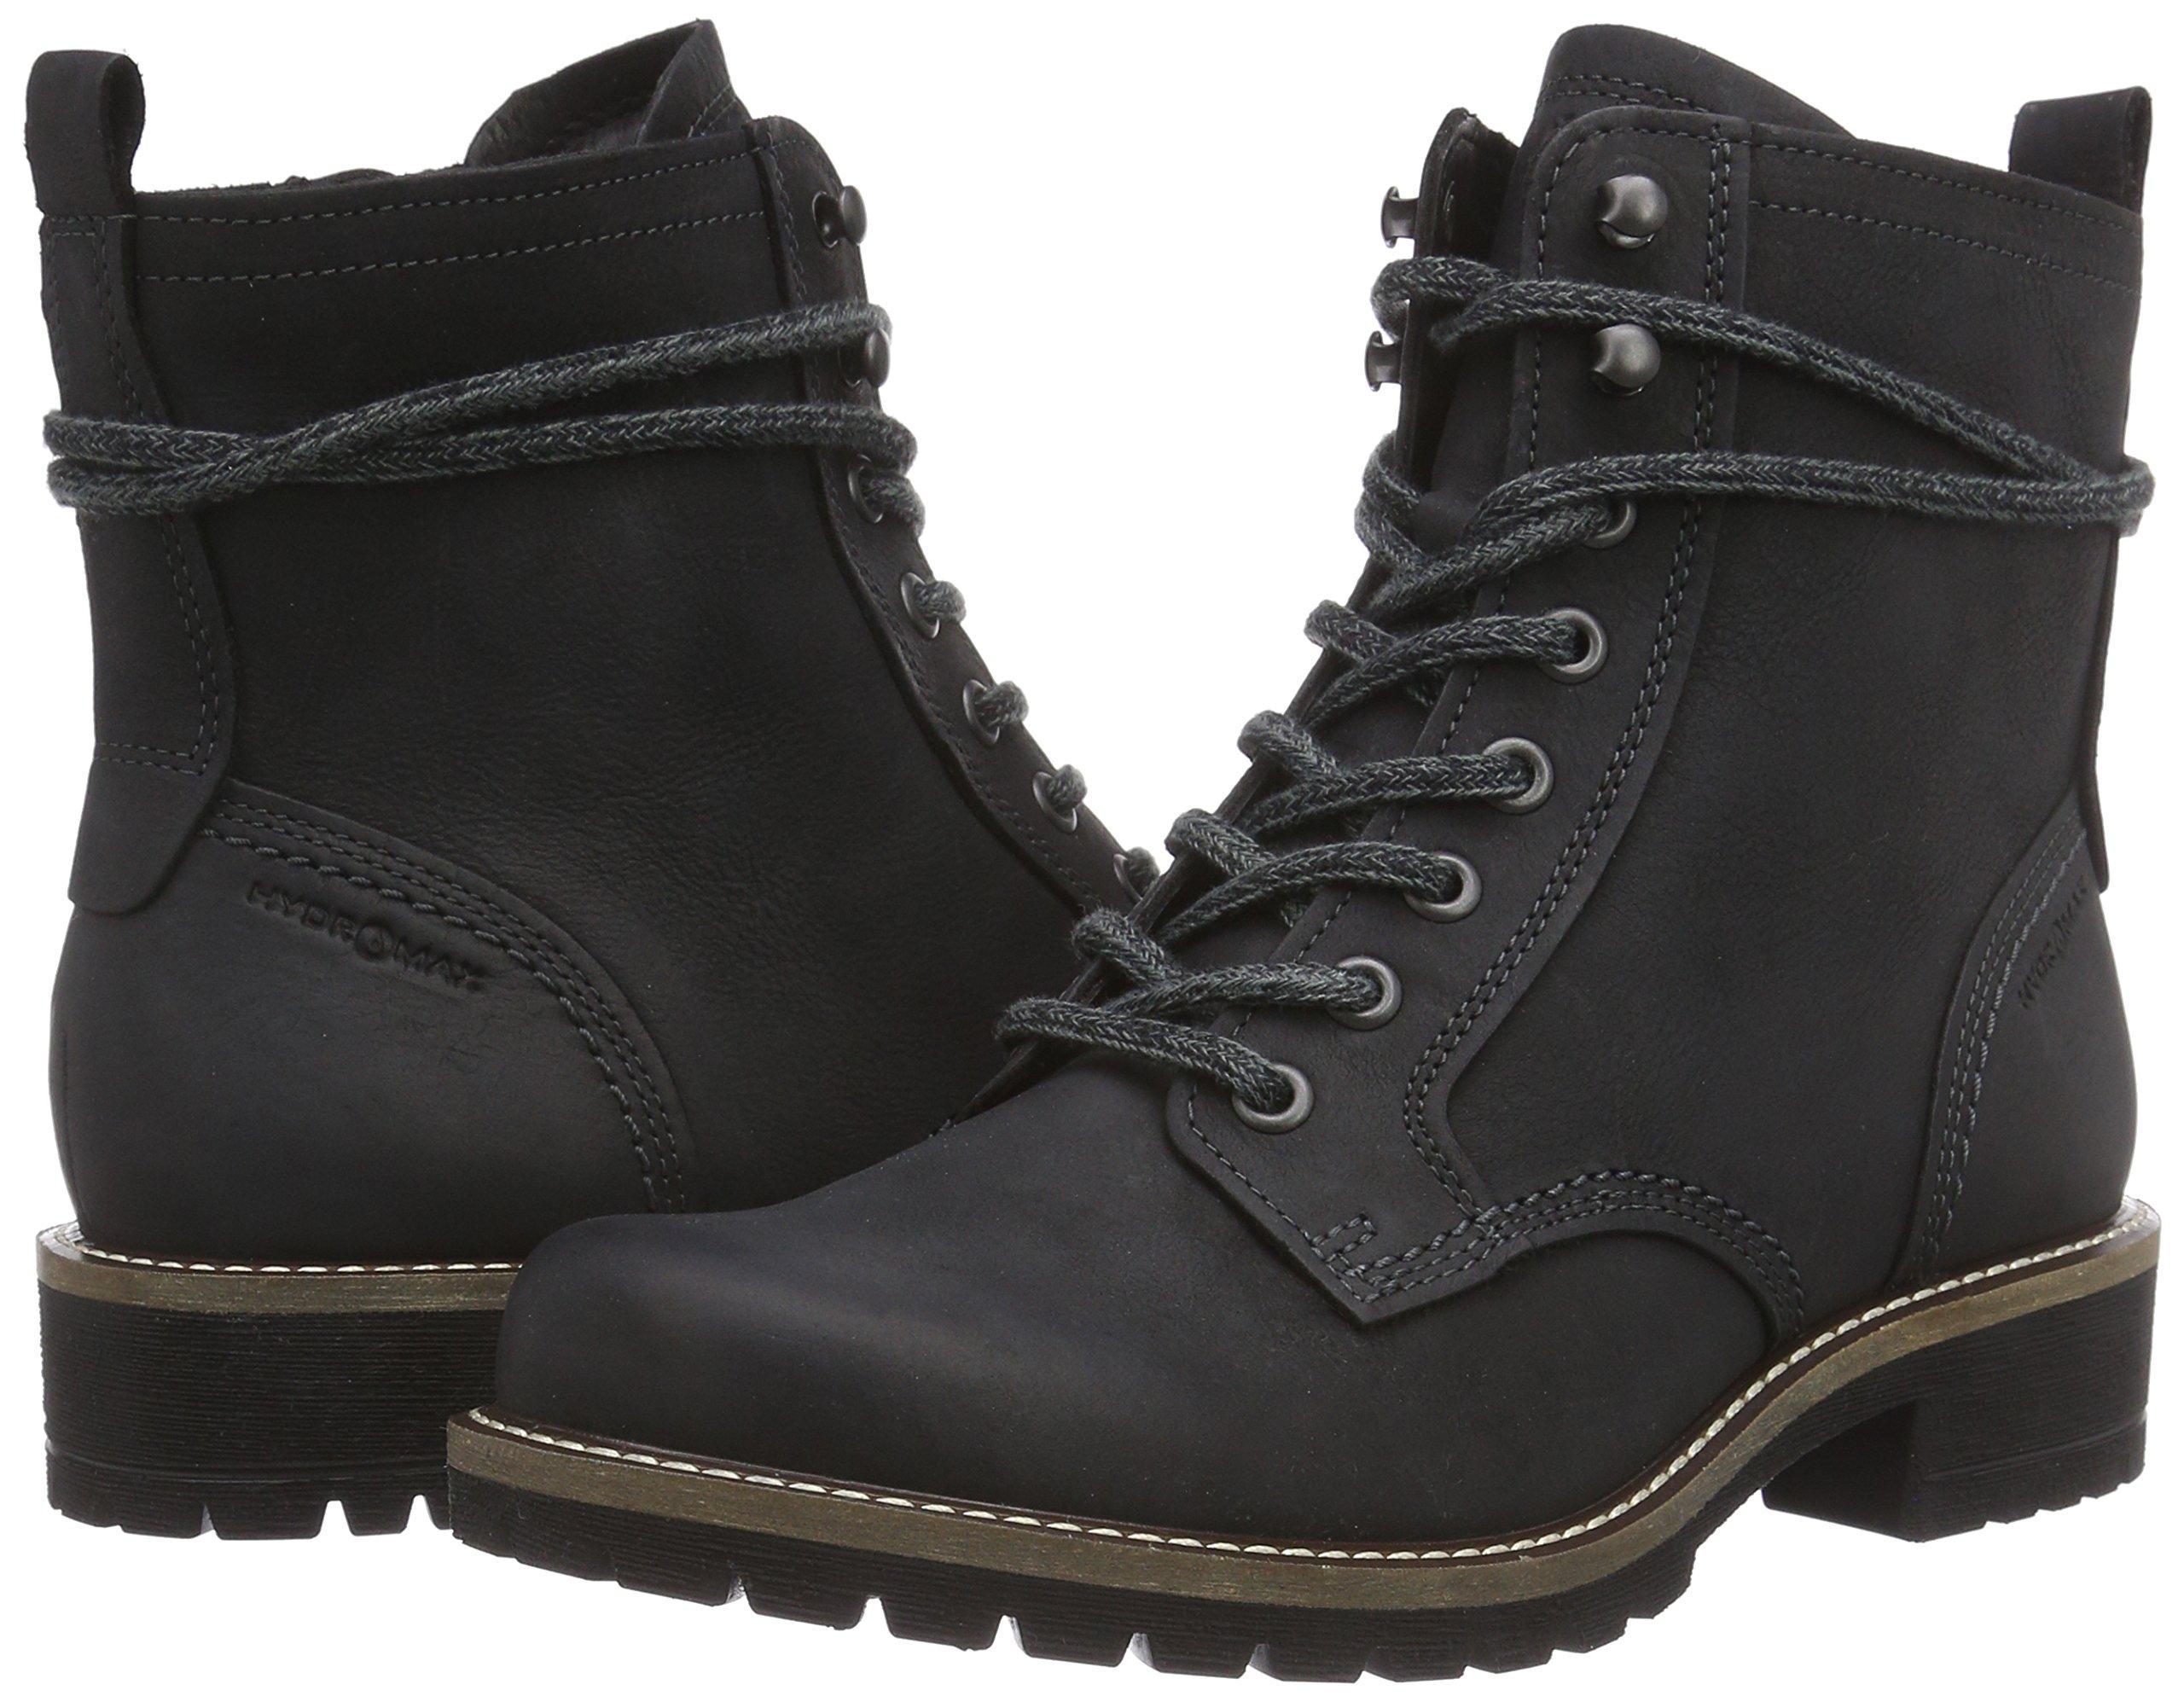 Ecco Footwear Womens Elaine Boot, Black, 37 EU/6-6.5 M US by ECCO (Image #6)